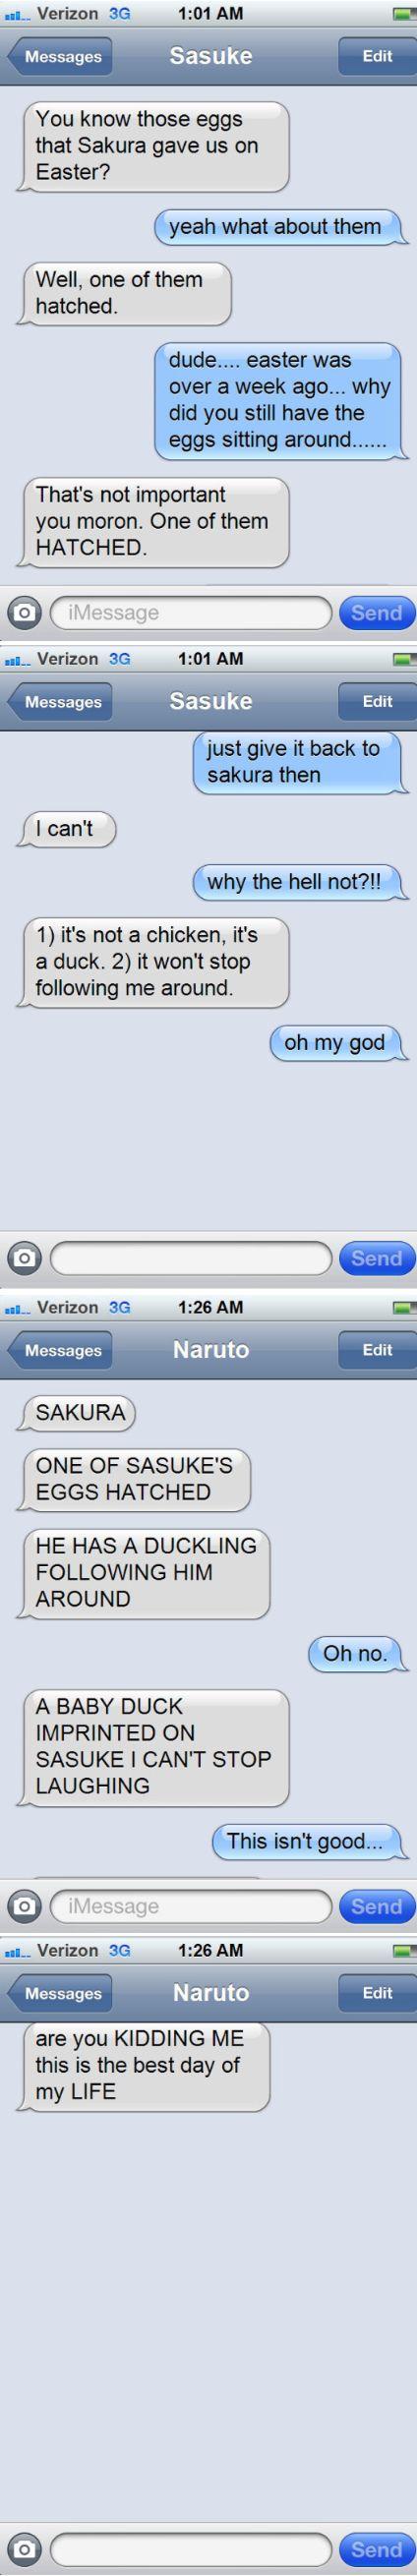 <3 Naruto, Sasuke & Sakura  Makes sense naruto called saskue's hair duck but hair lol and the duck thinks saskue's it's mother lol I love dis credits to the person who made it